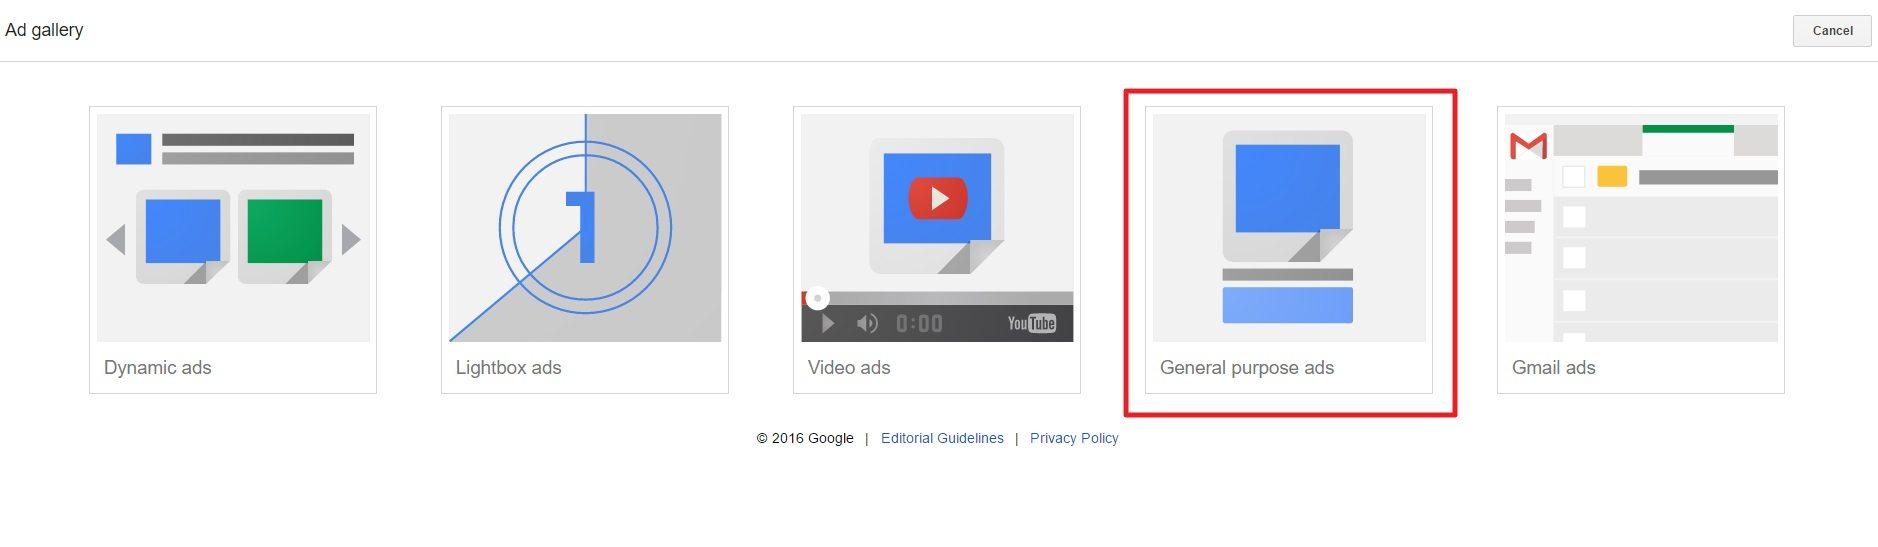 ad-gallery-create-google-display-ads